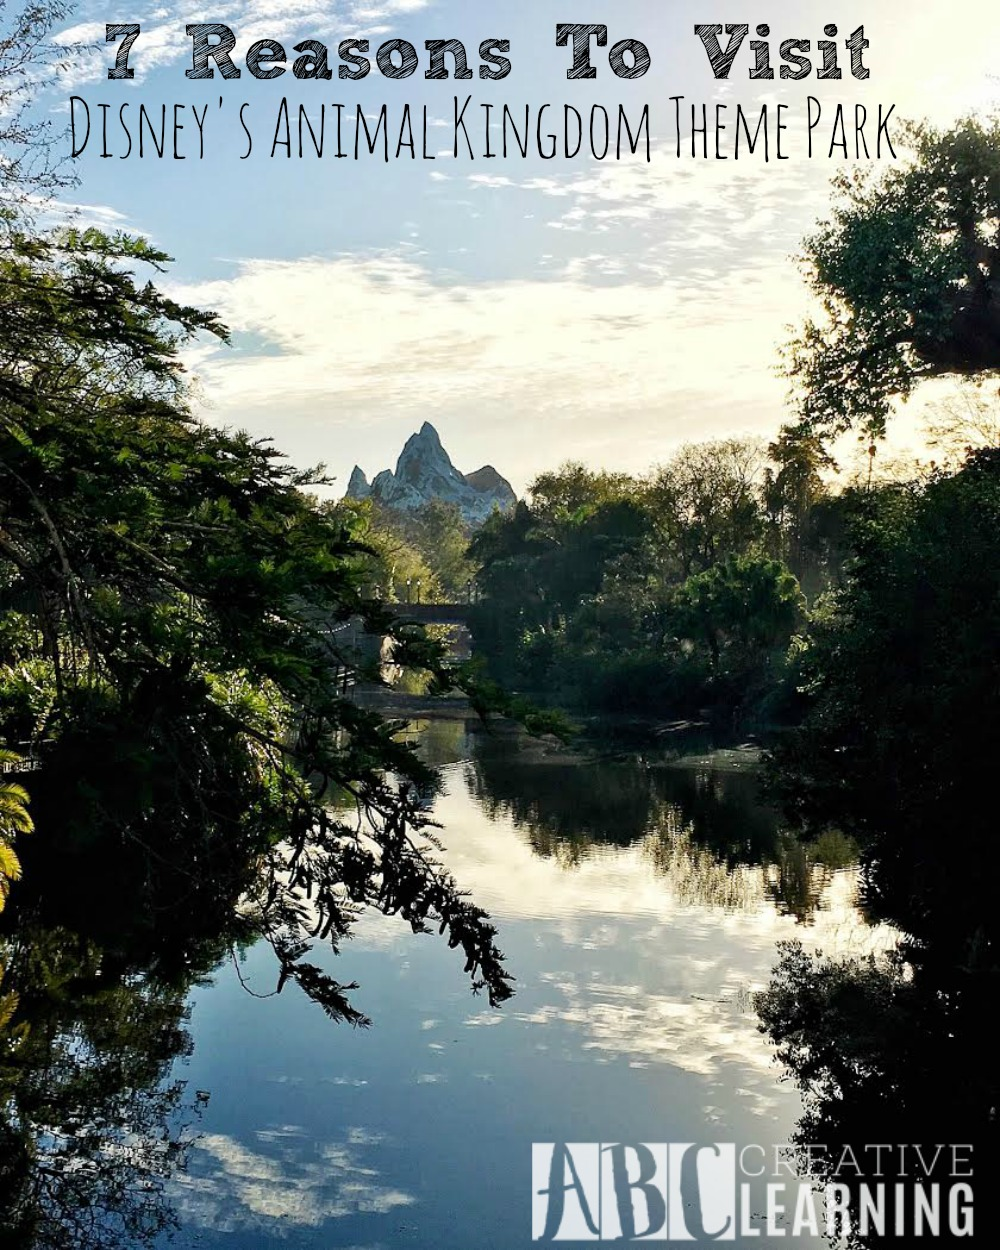 7 Reasons To Visit Disney's Animal Kingdom Theme Park 0